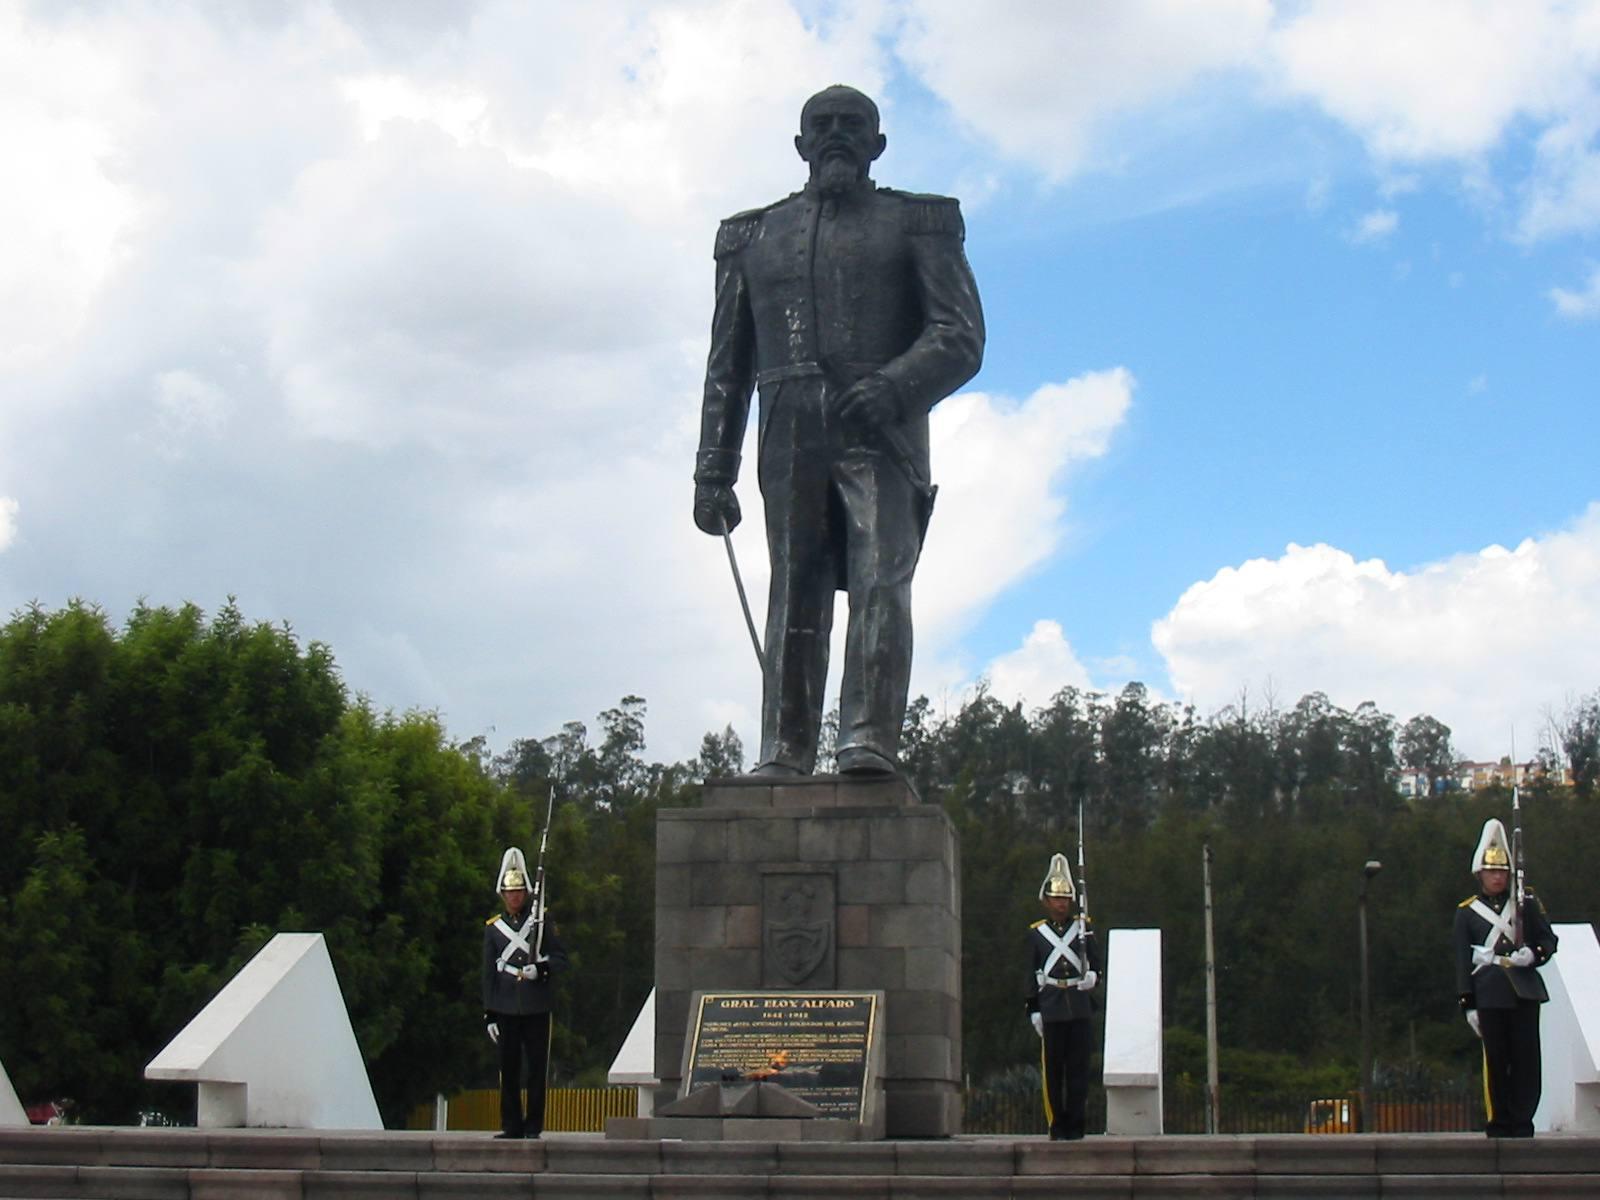 Monument to Eloy Alfaro